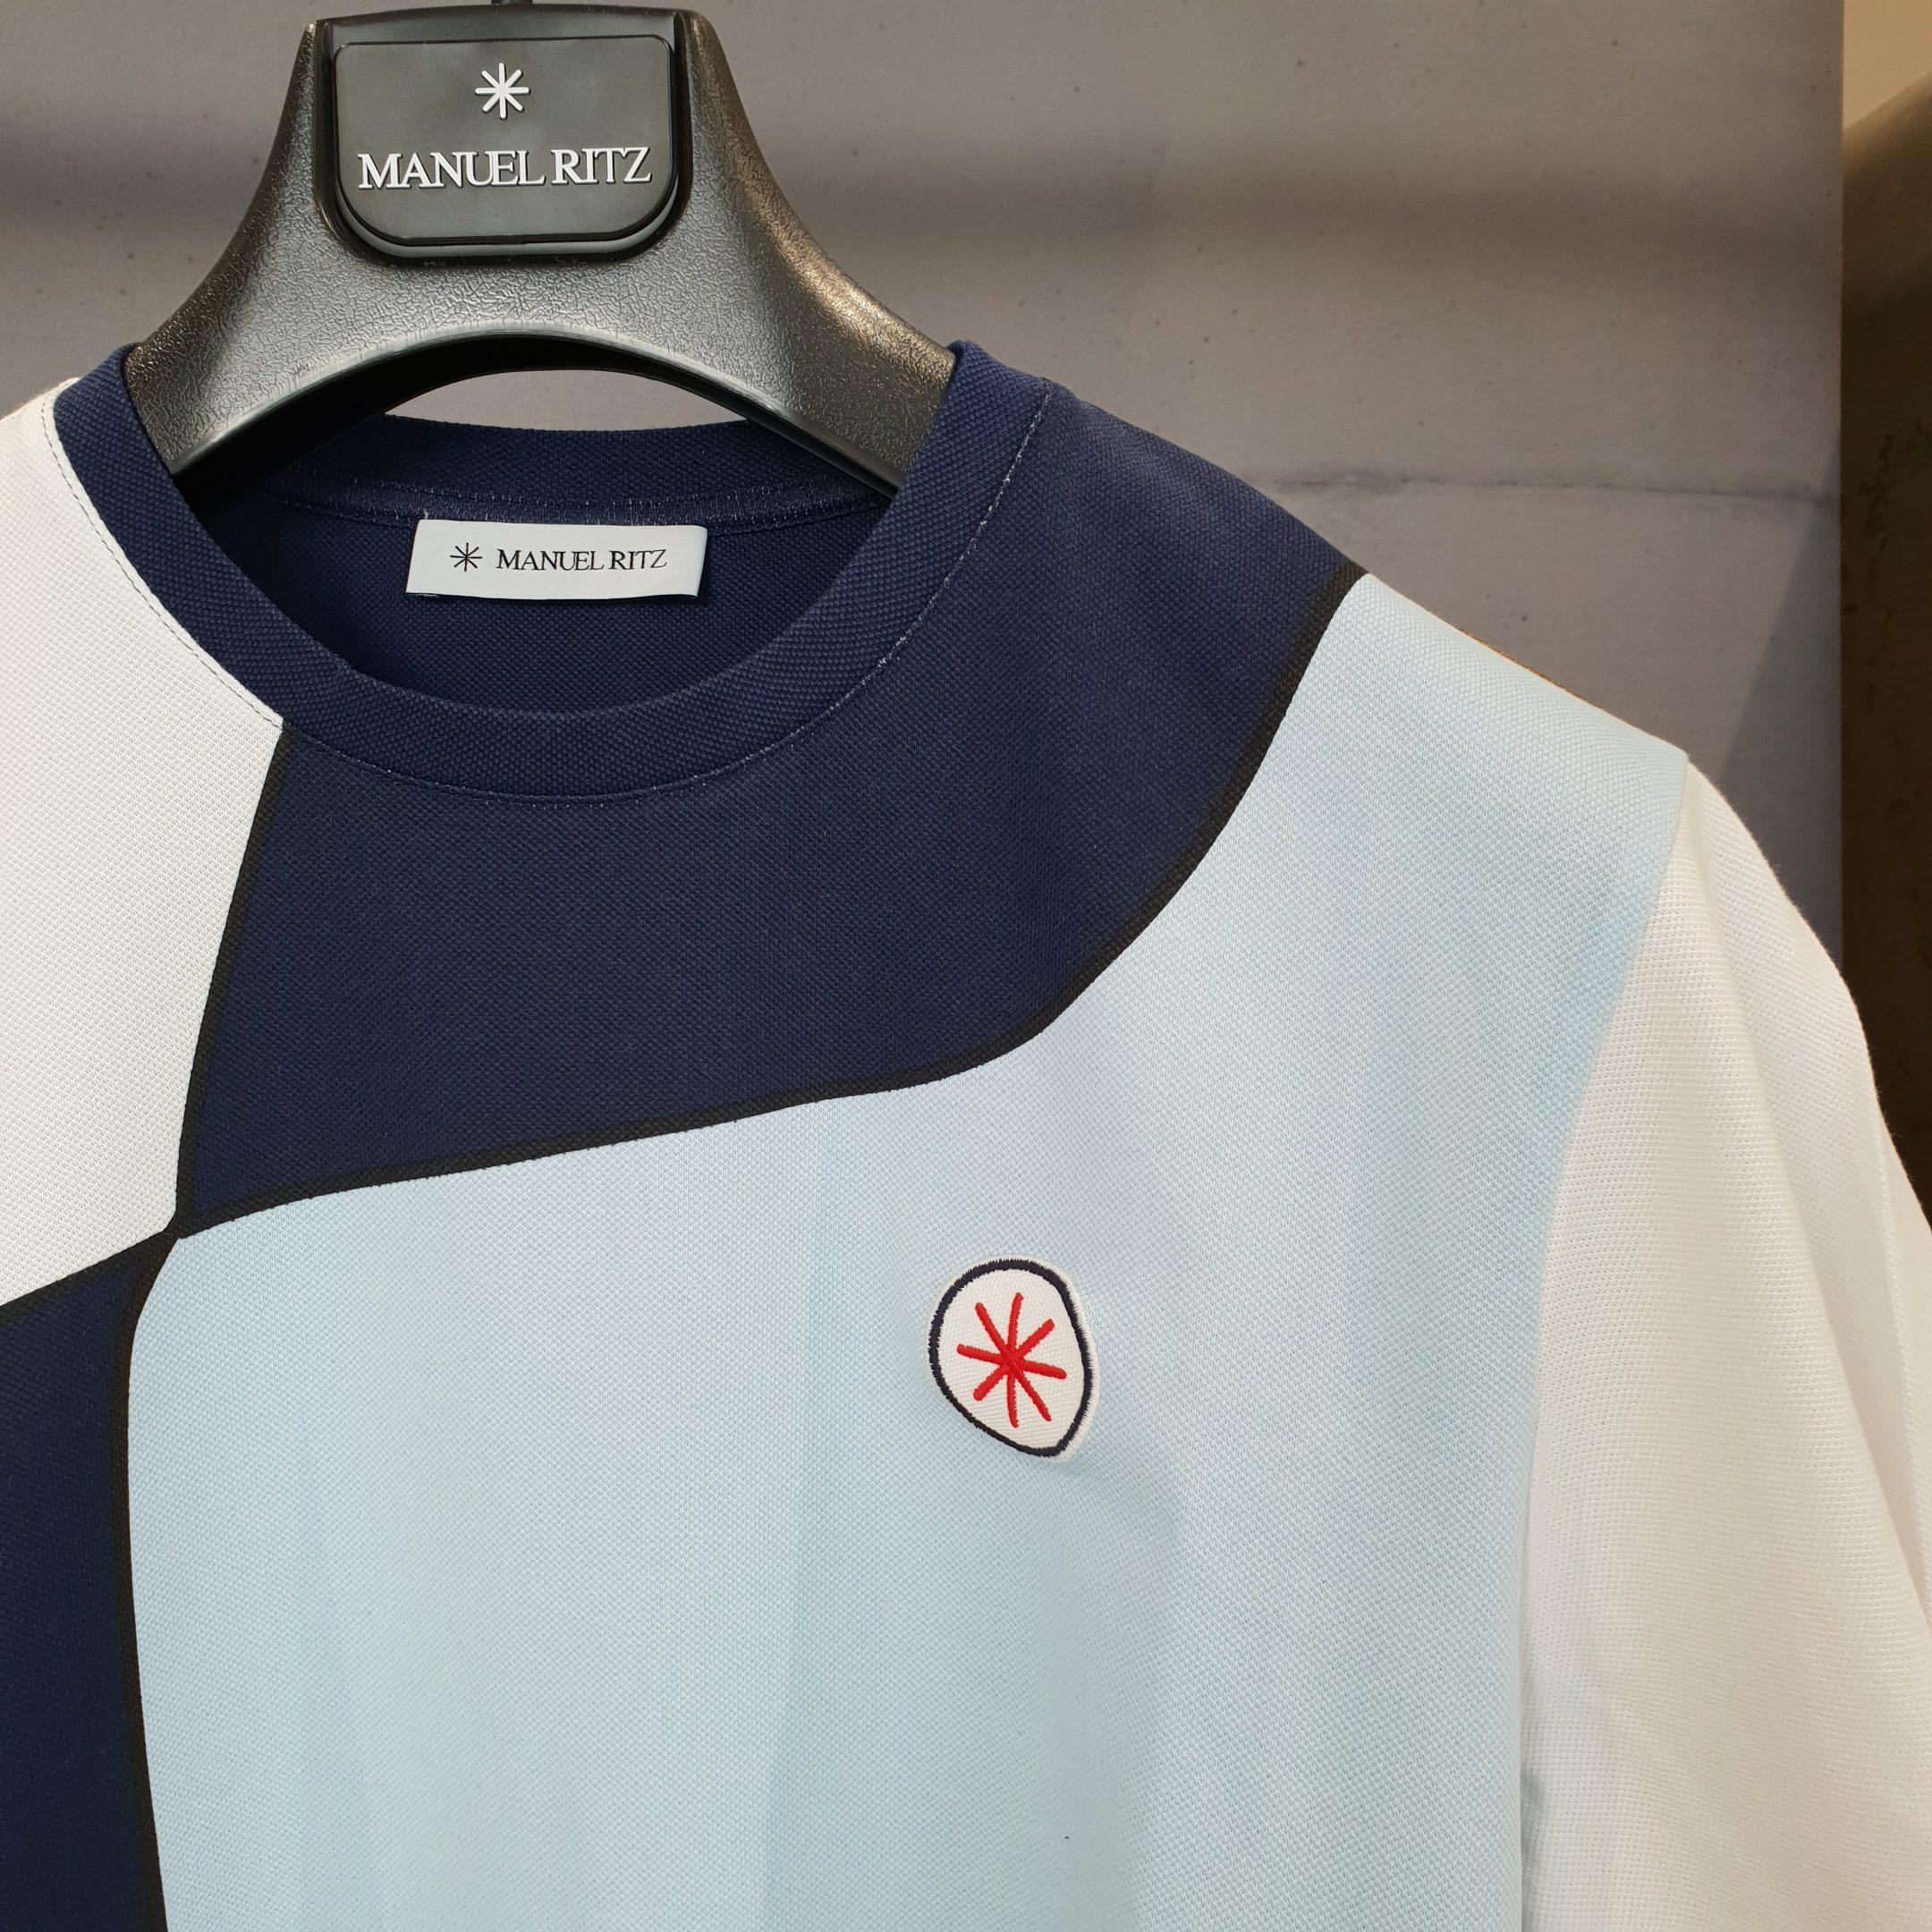 MANUEL RITZ T-Shirt Uomo XL Azzurro 2632m528 193383 Primavera Estate 2019